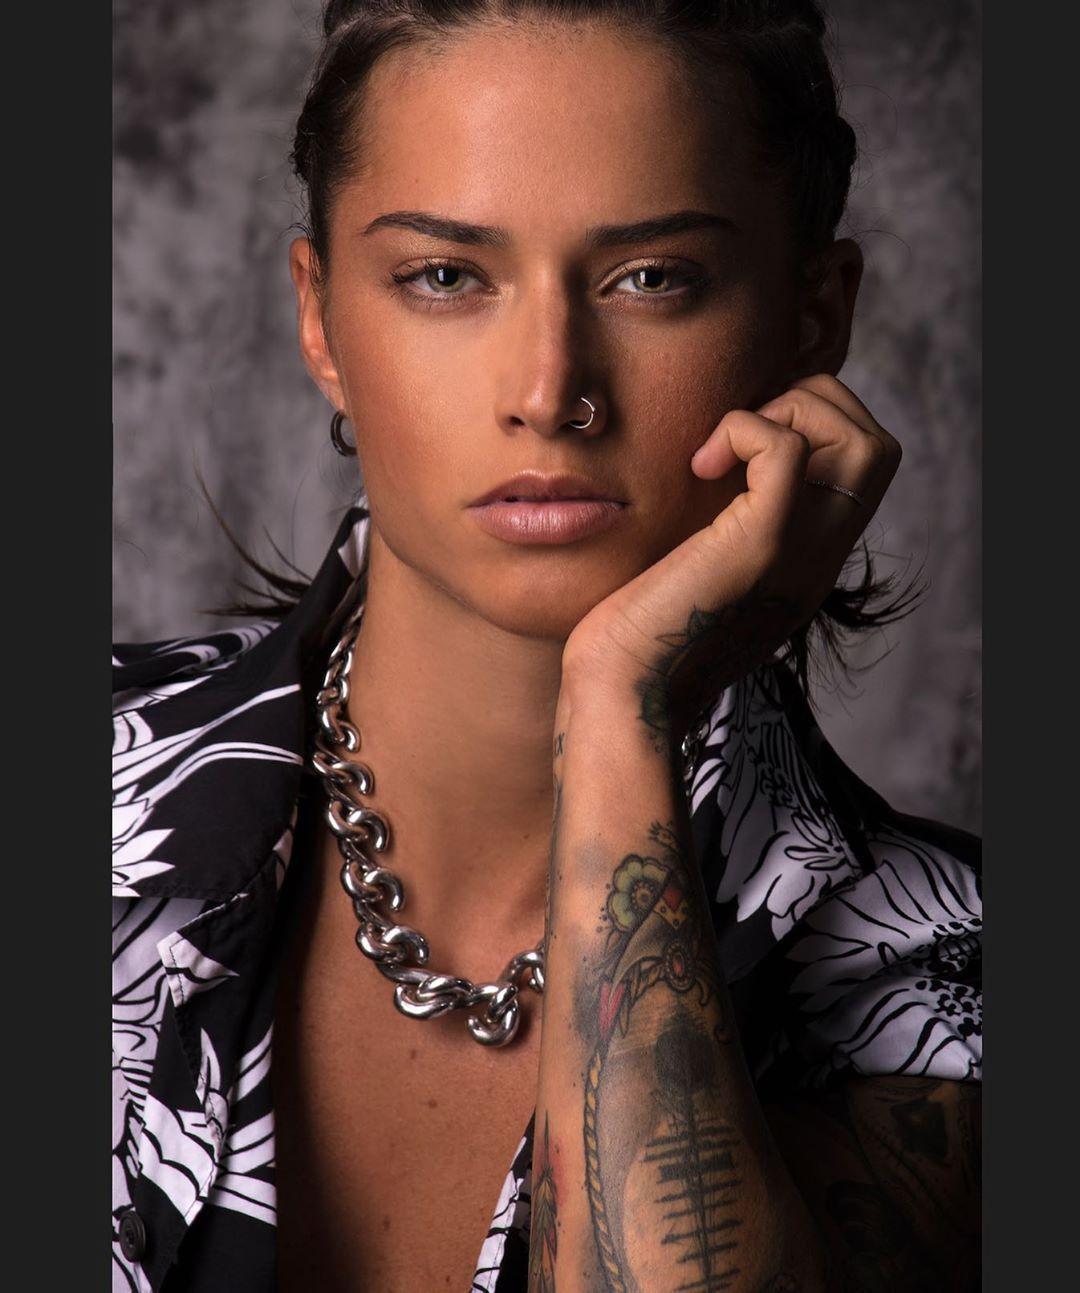 "Ylenia Riniti on Instagram: ""???? #photooftheday #italiangirl #hairstyle #tattoo #tomboy #shooting #eyes #instagood #tomboygirl #piercing #moment"" #tomboyhairstyles Ylenia Riniti on Instagram: ""???? #photooftheday #italiangirl #hairstyle #tattoo #tomboy #shooting #eyes #instagood #tomboygirl #piercing #moment"""